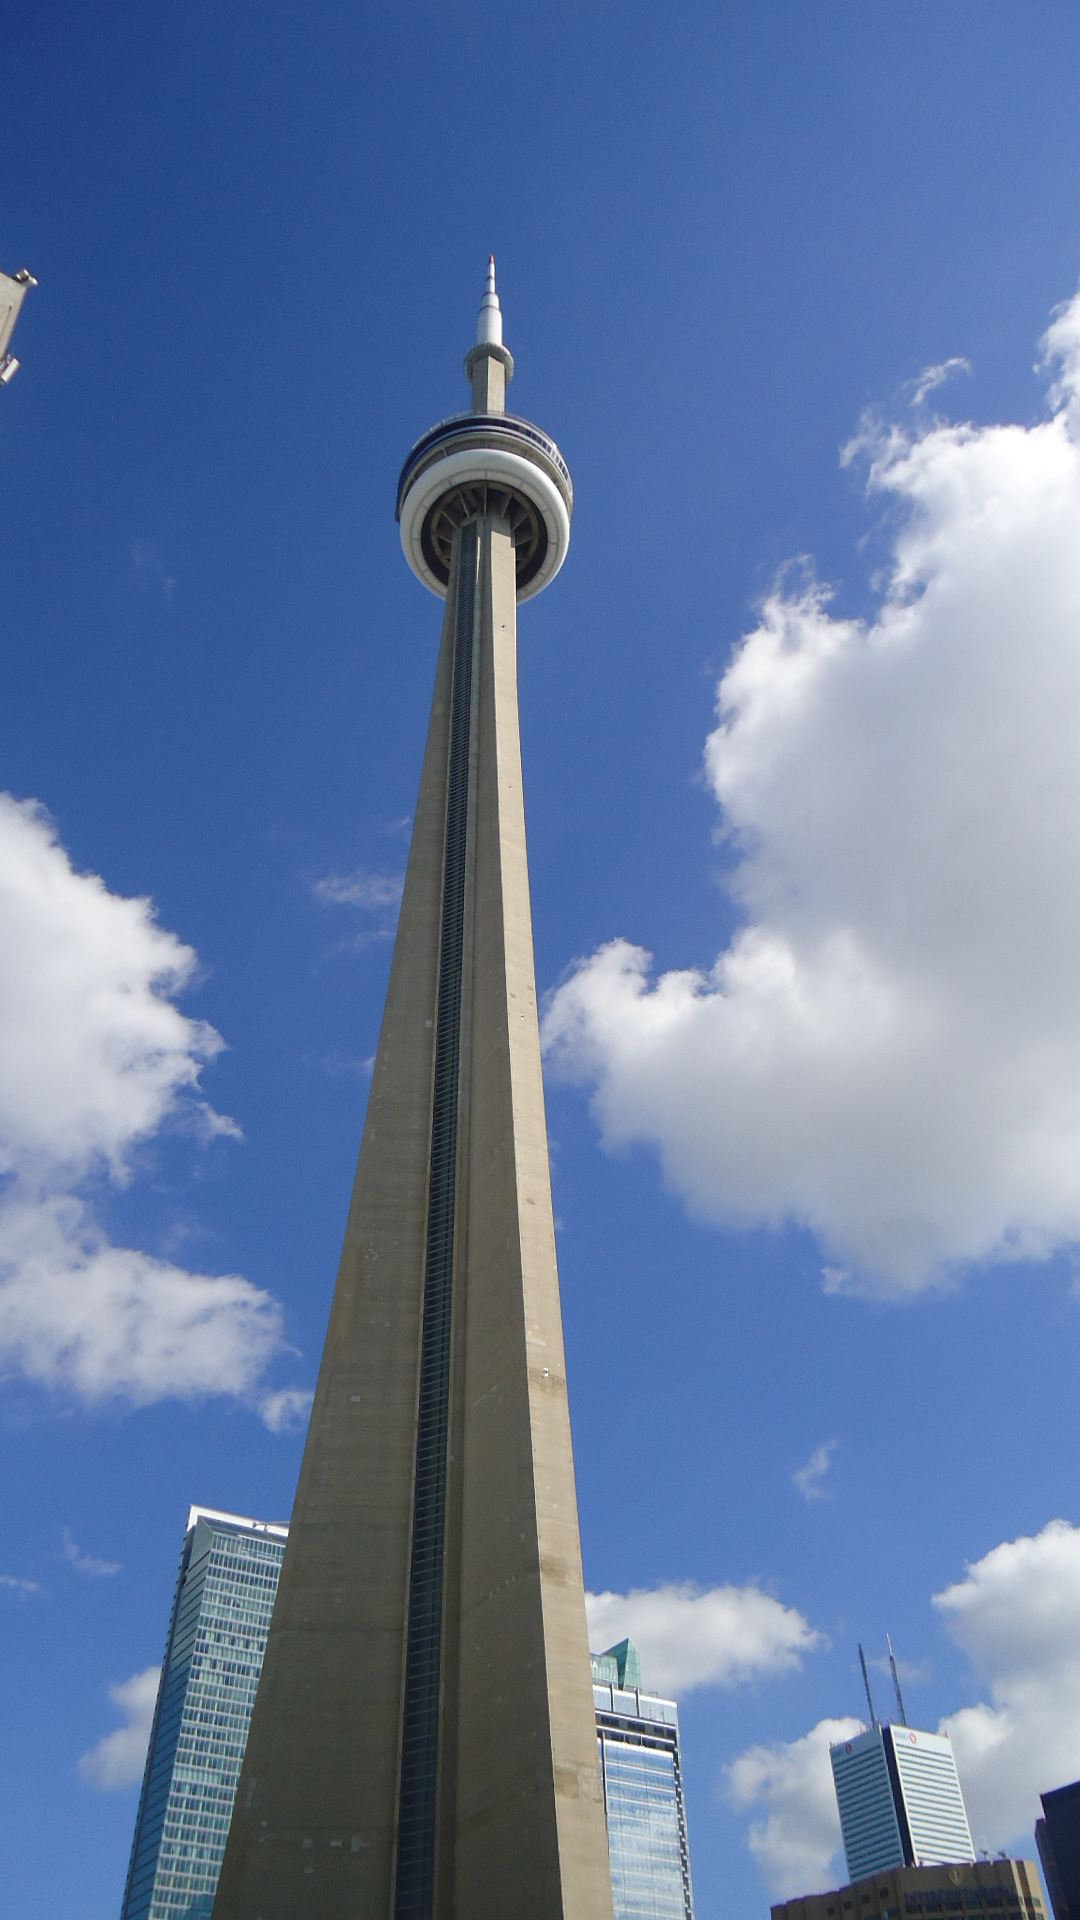 File:CN Tower 03.JPG - Wikimedia Commons